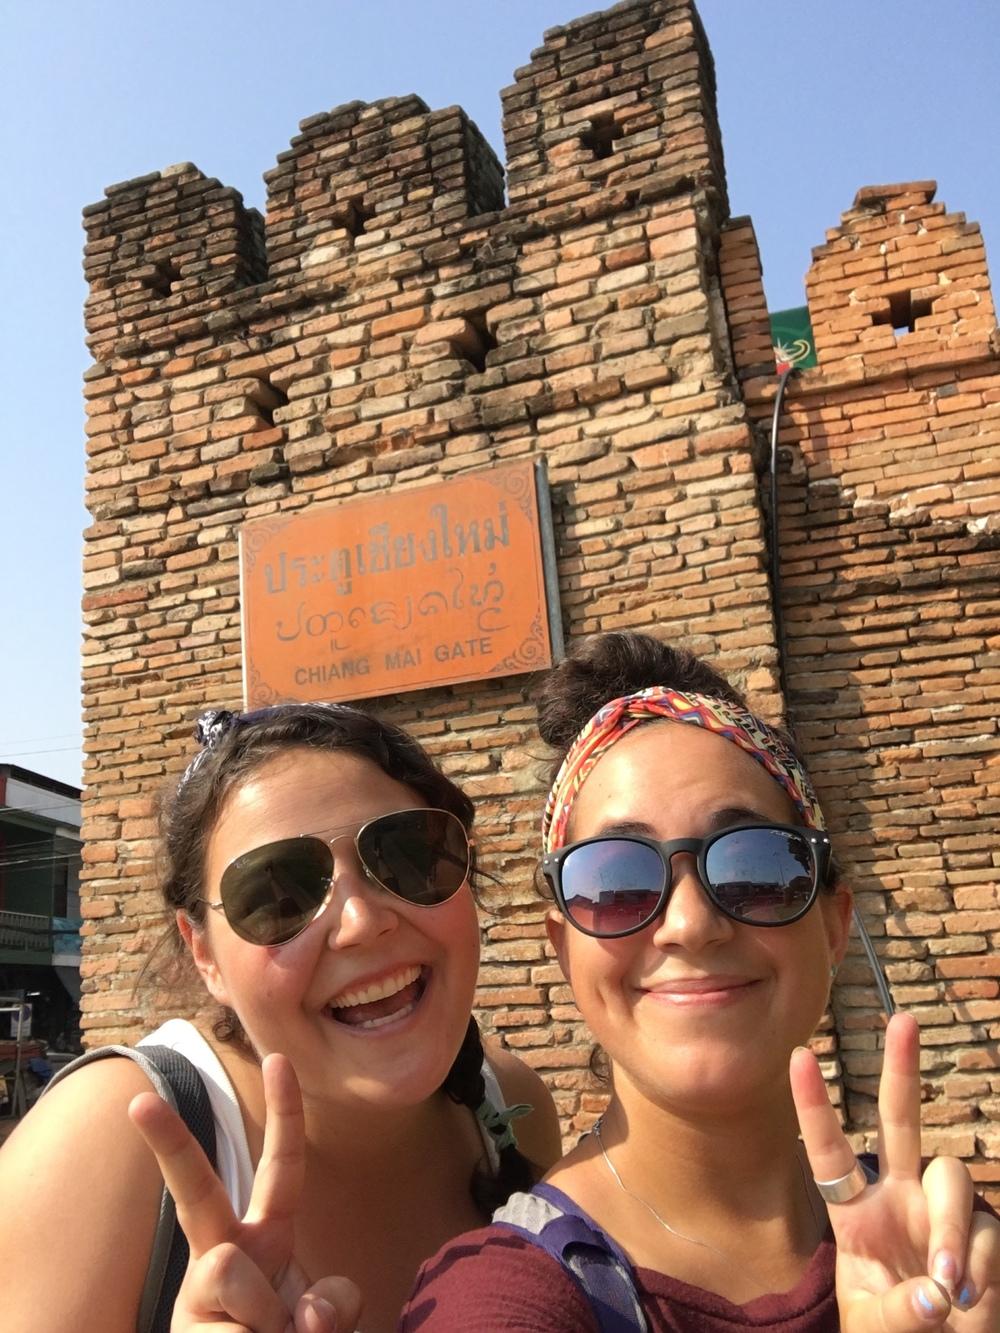 gotta selfie at the Chiang Mai gate